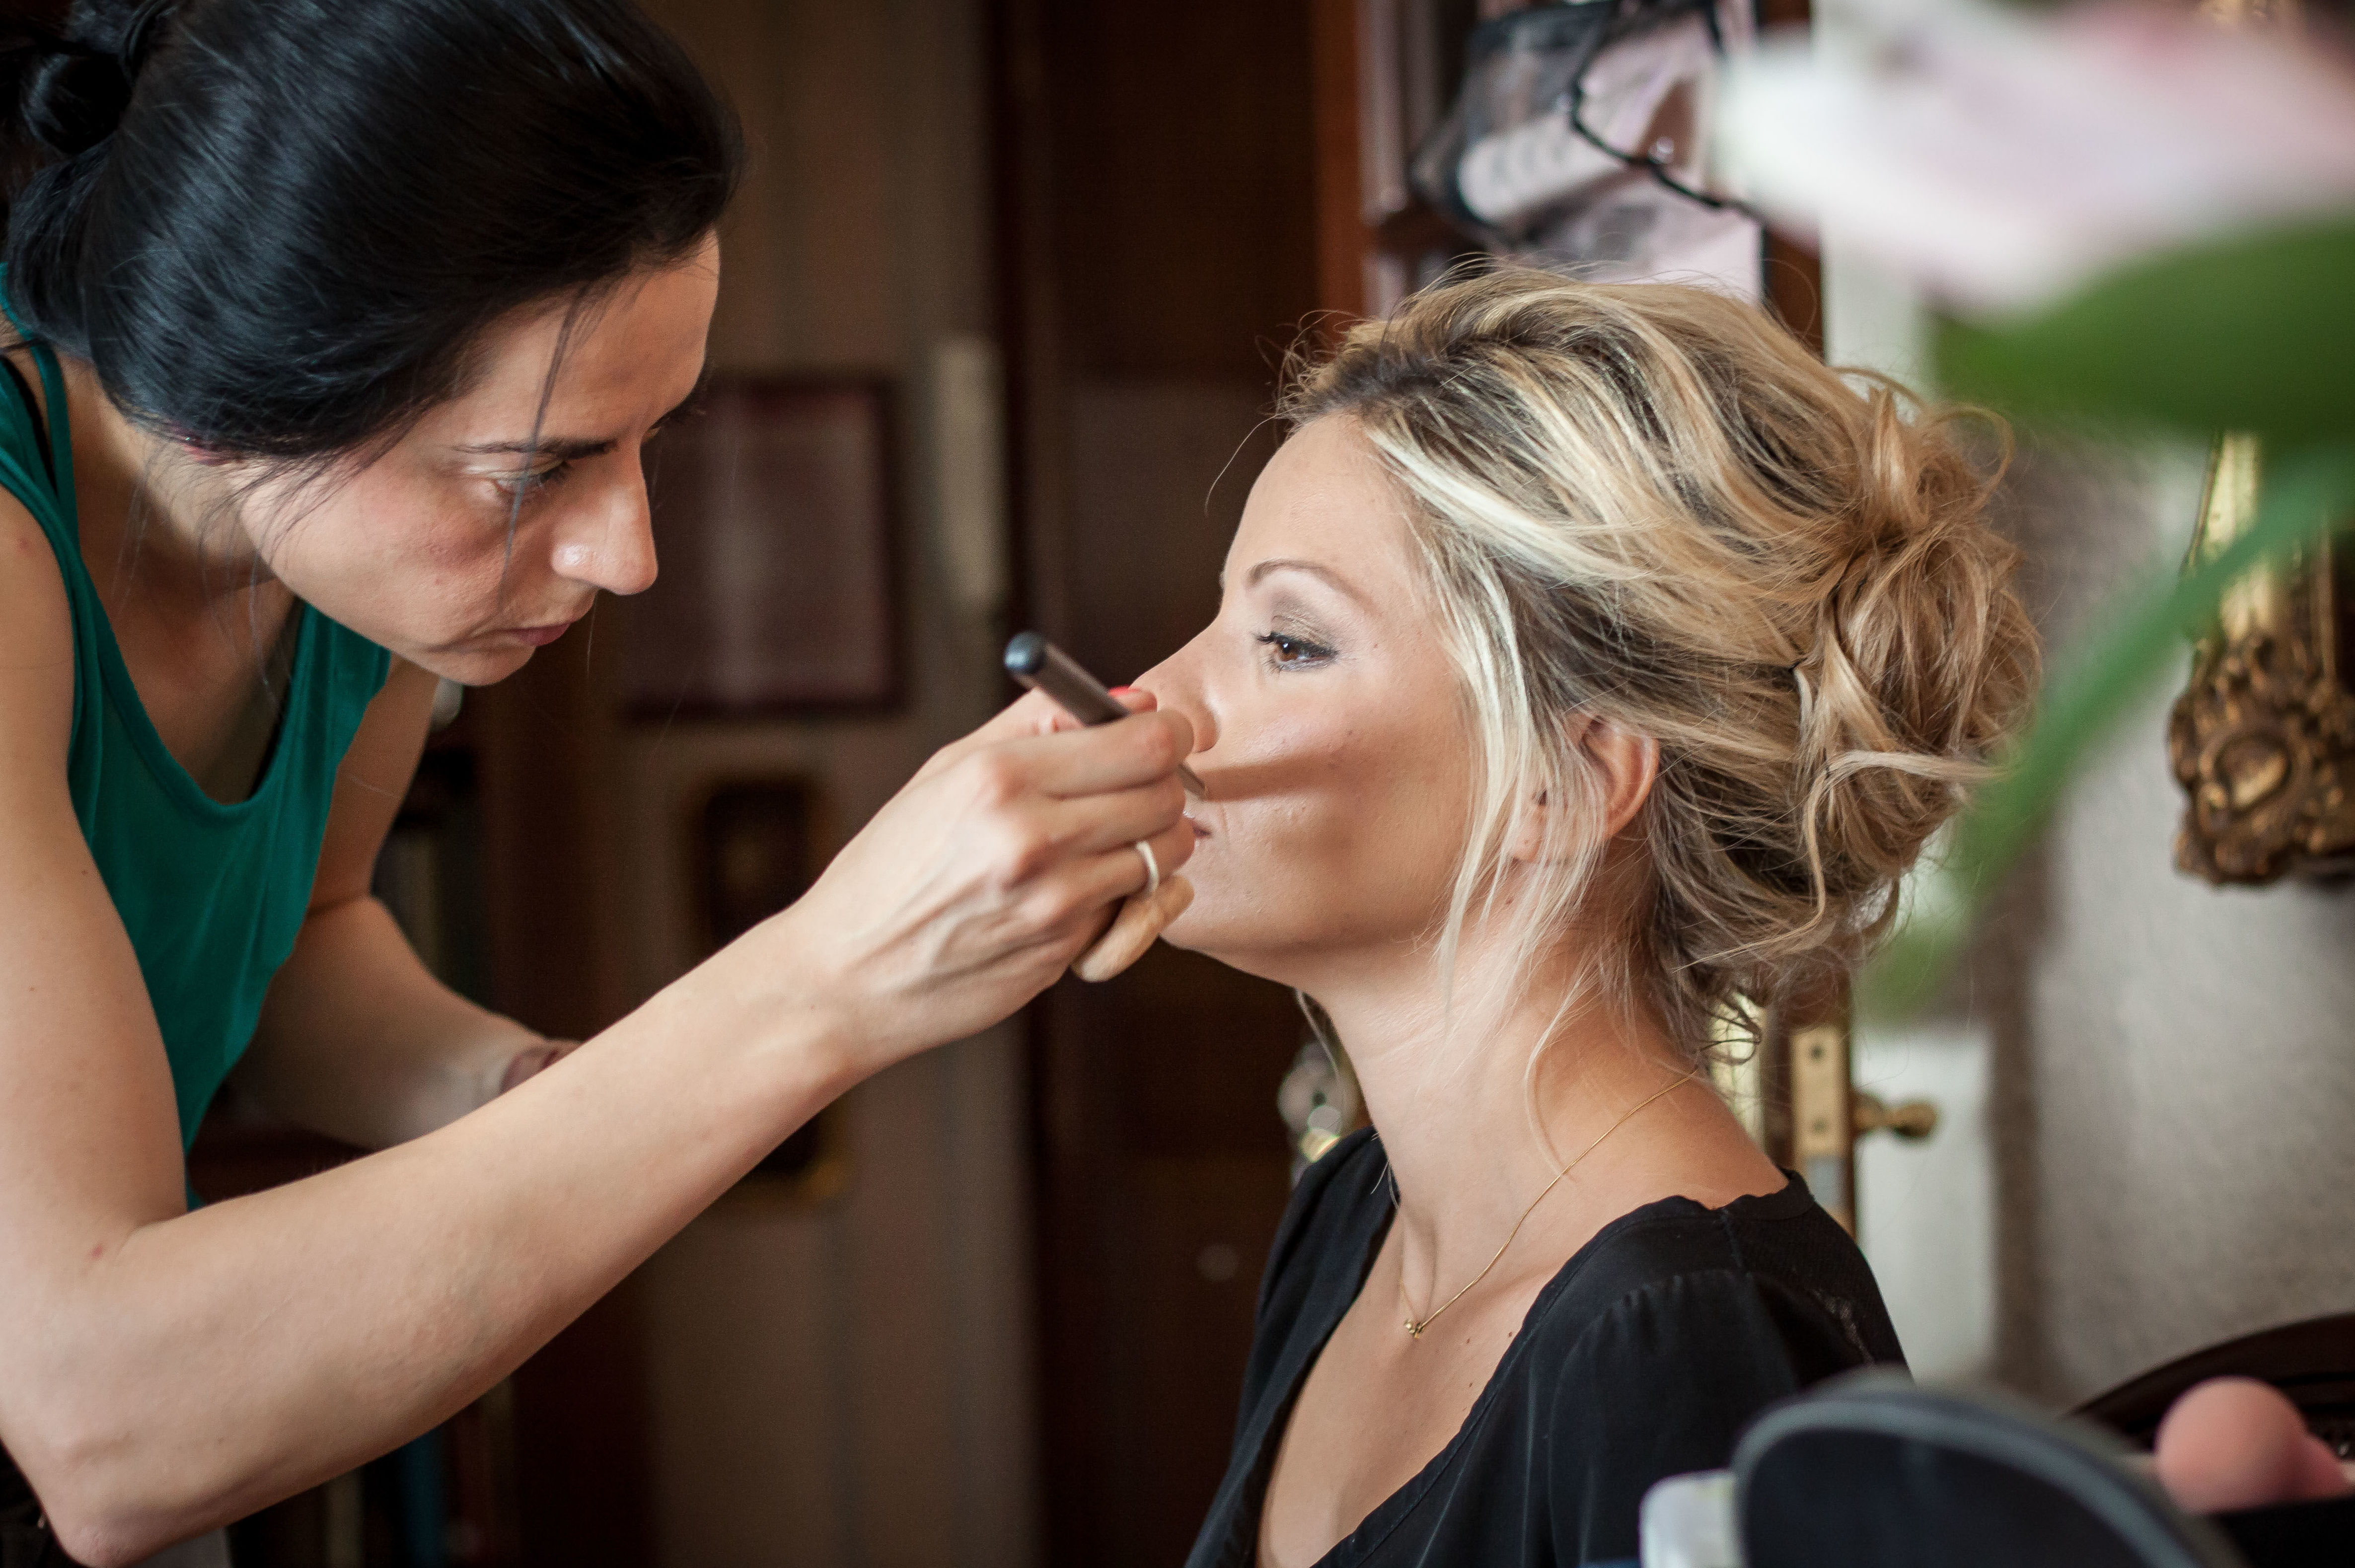 Foto 32 de Maquillaje profesional en Zaragoza | Tht maquilladora